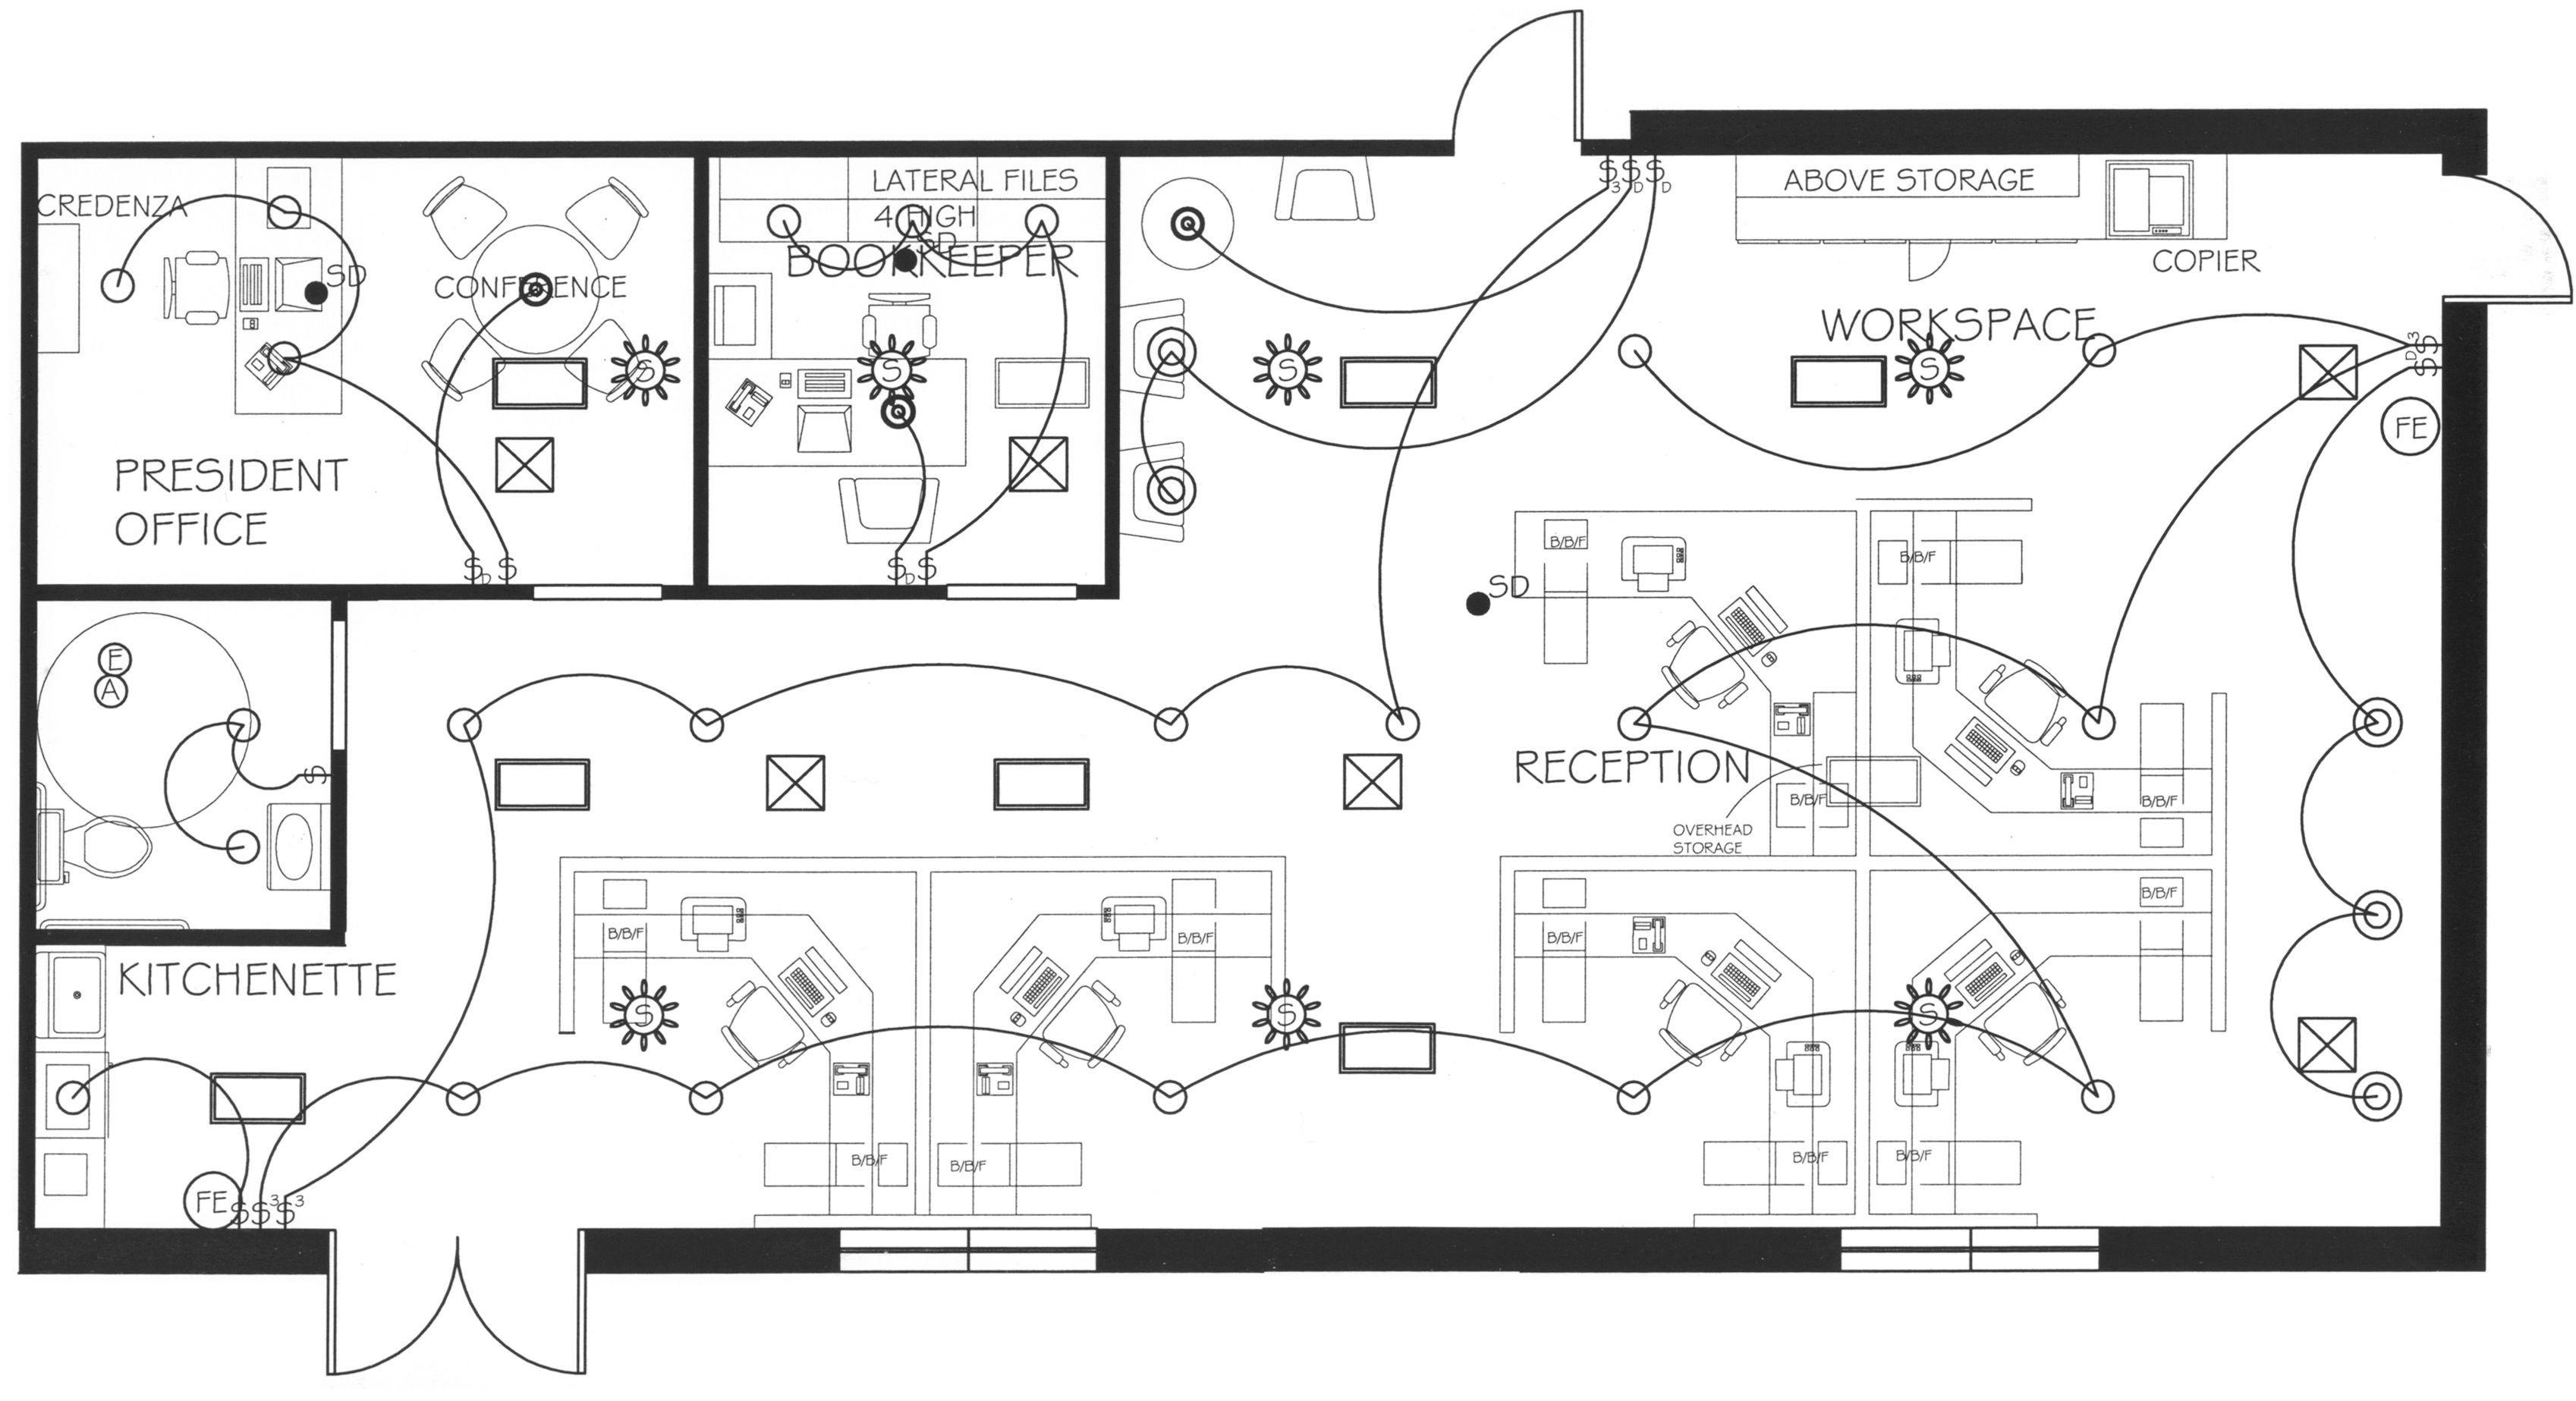 medium resolution of new electrical floor plan sample diagram wiringdiagram diagramming diagramm visuals